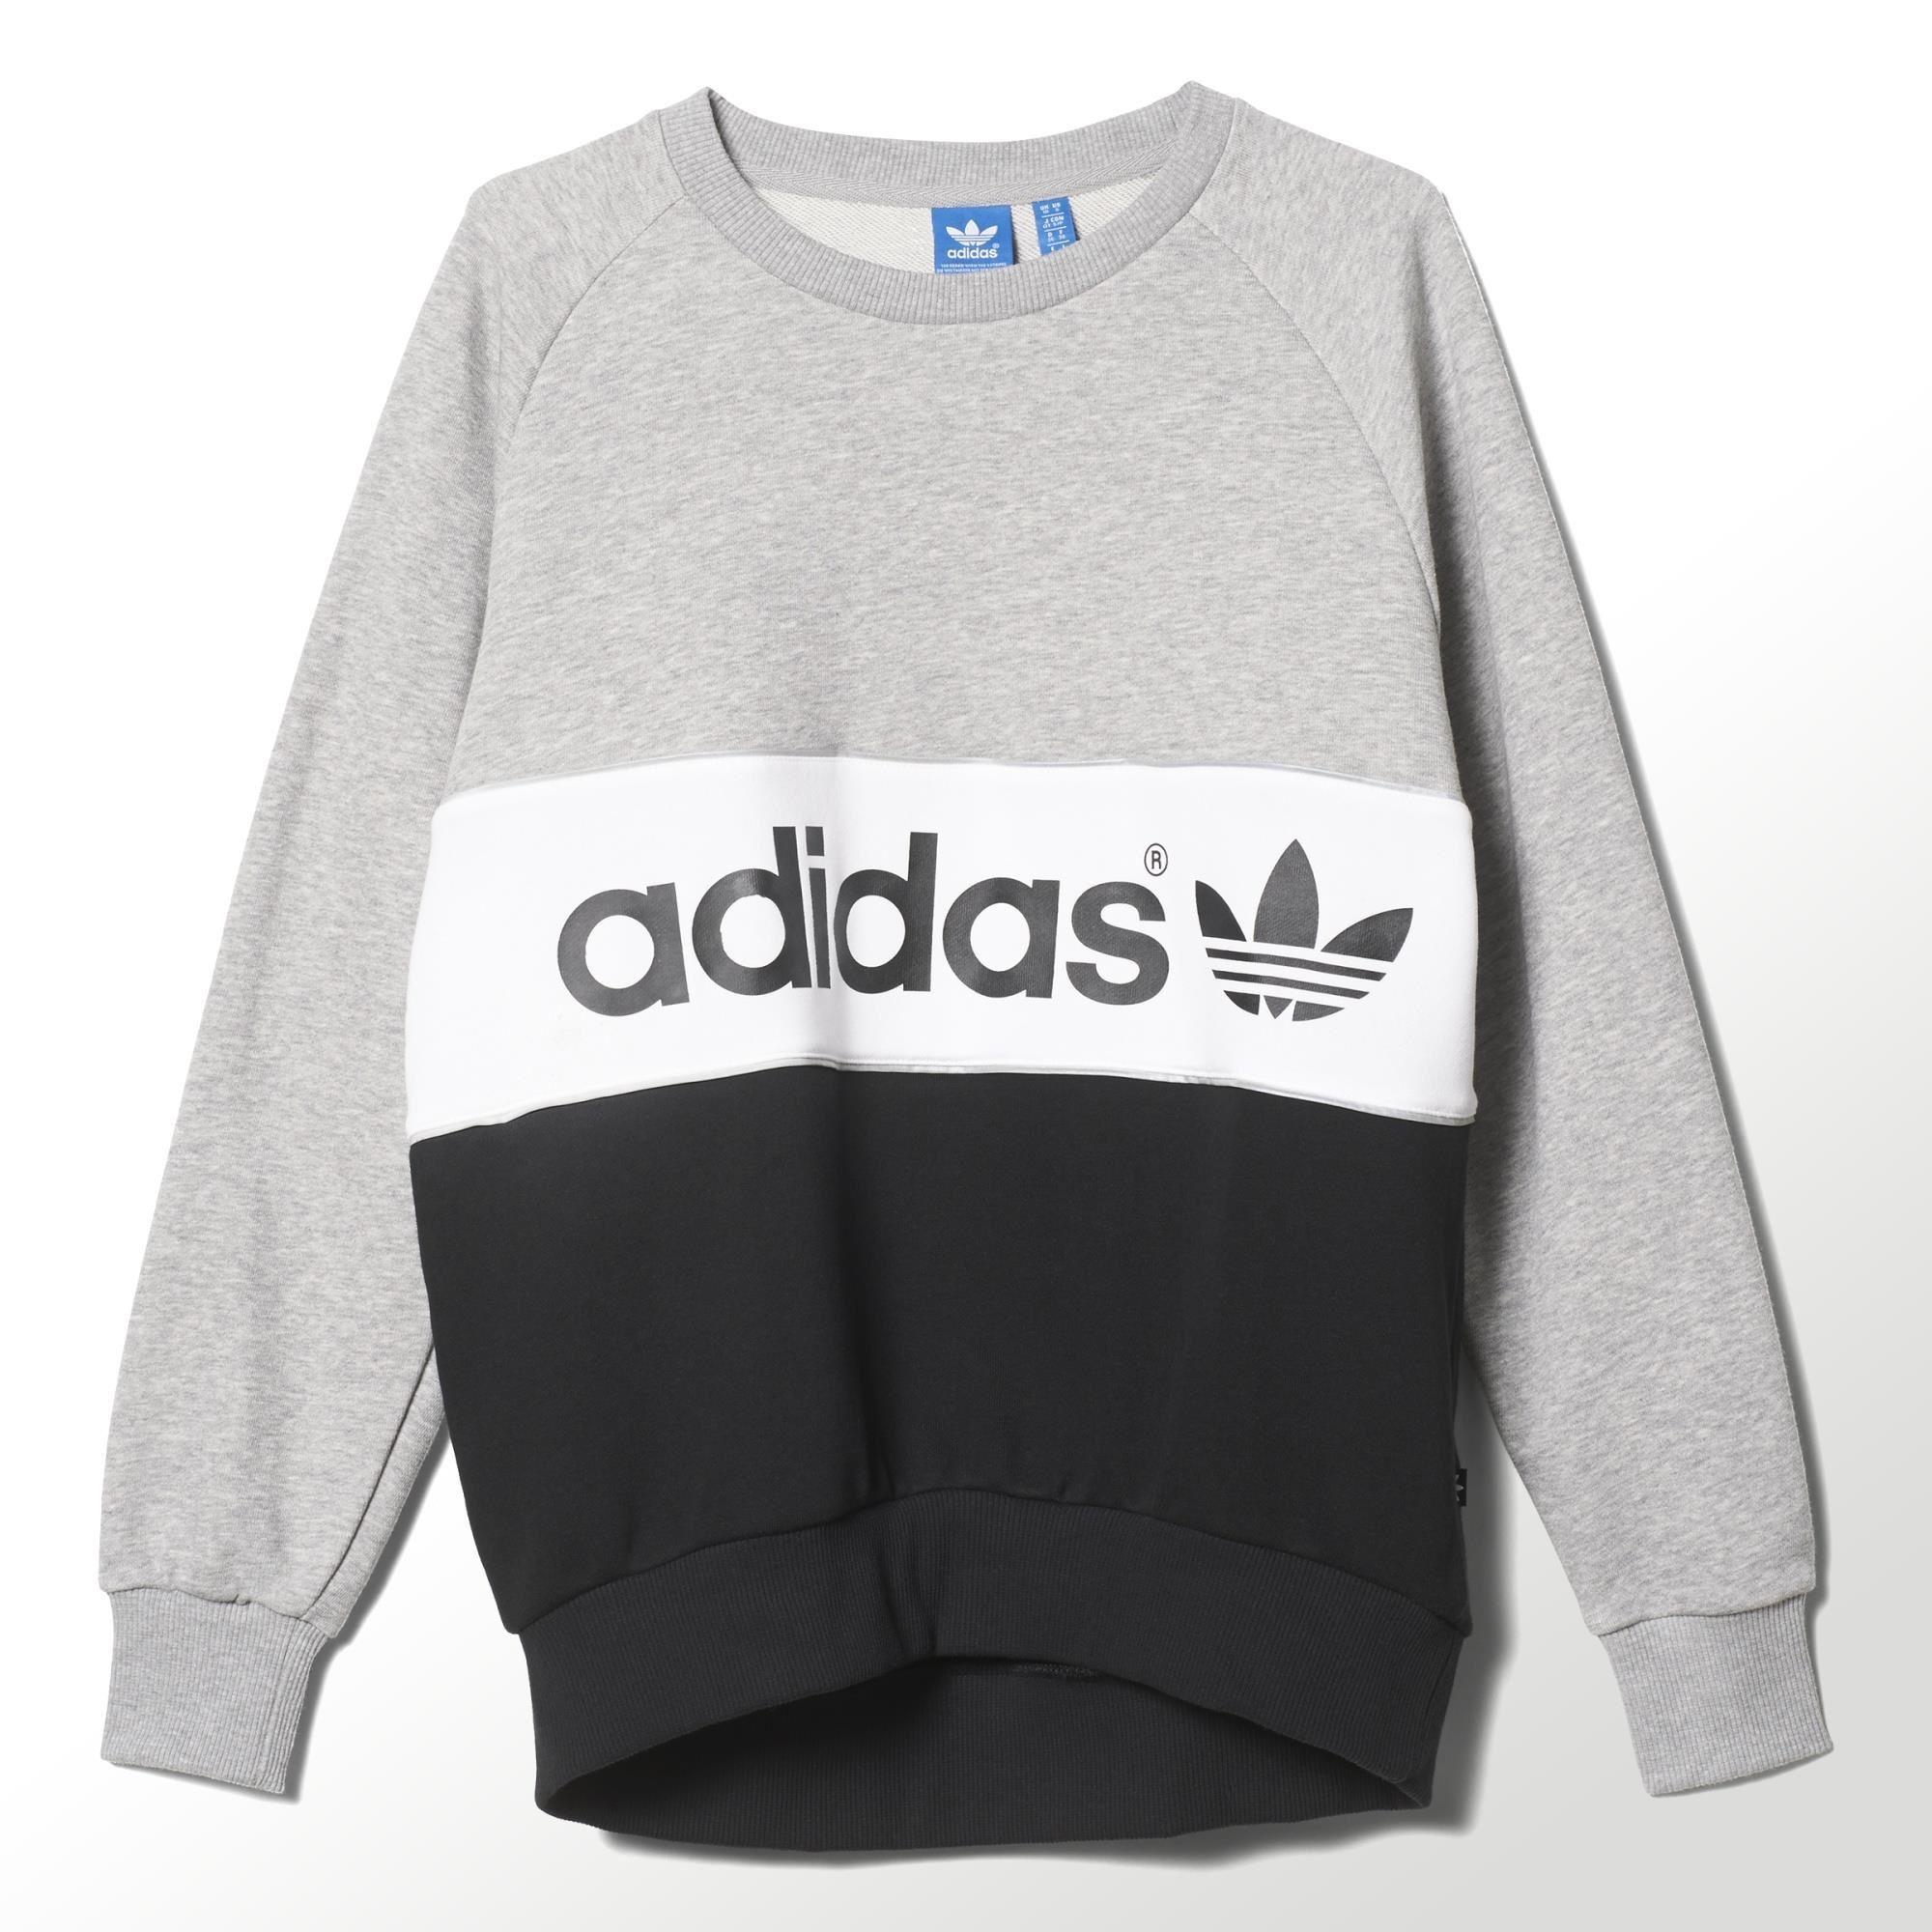 Adidas City Tokyo Sweatshirt 55 Sweater Available On Adidas Com Fashion Clothes Adidas Sweatshirt [ 2000 x 2000 Pixel ]